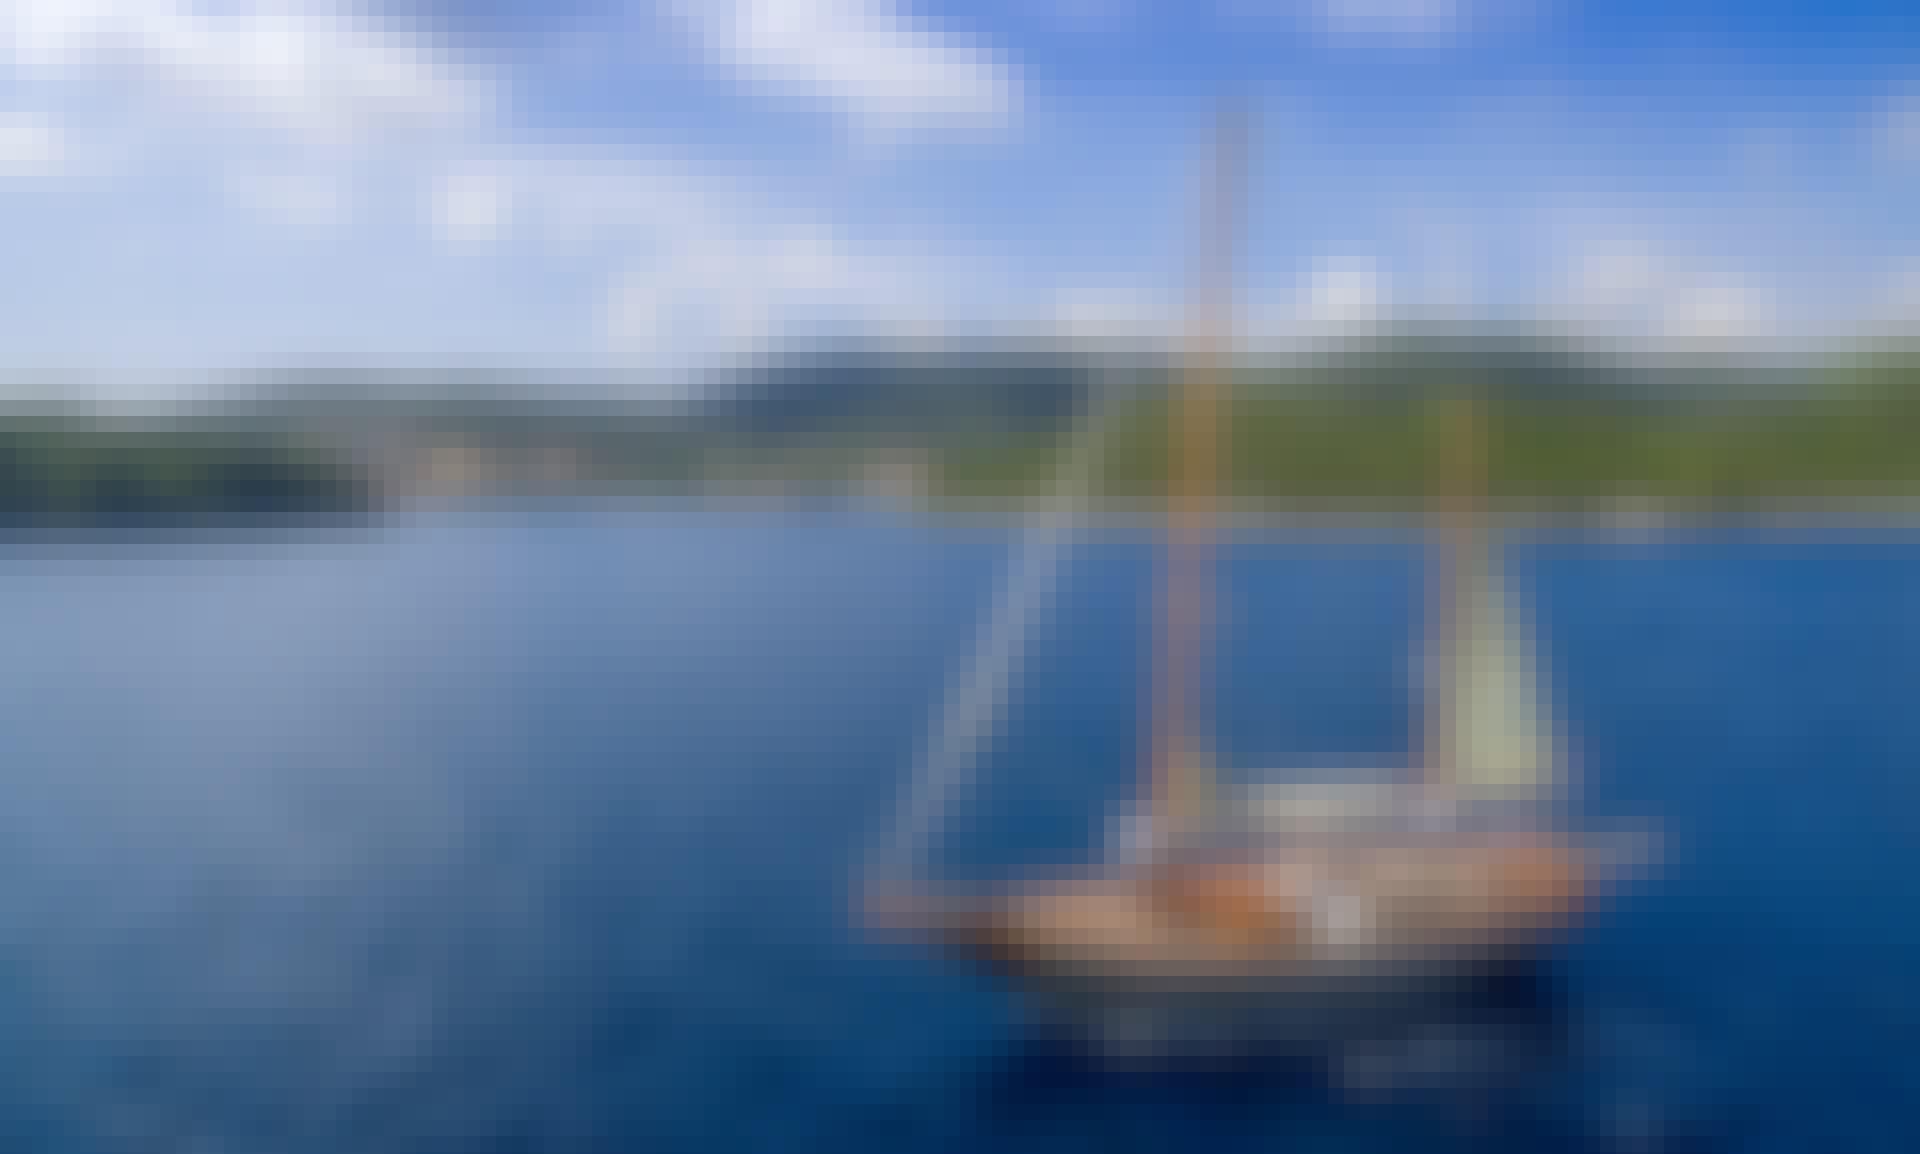 Explore Adriatic on board of vintage (2018 refit) yacht from Split